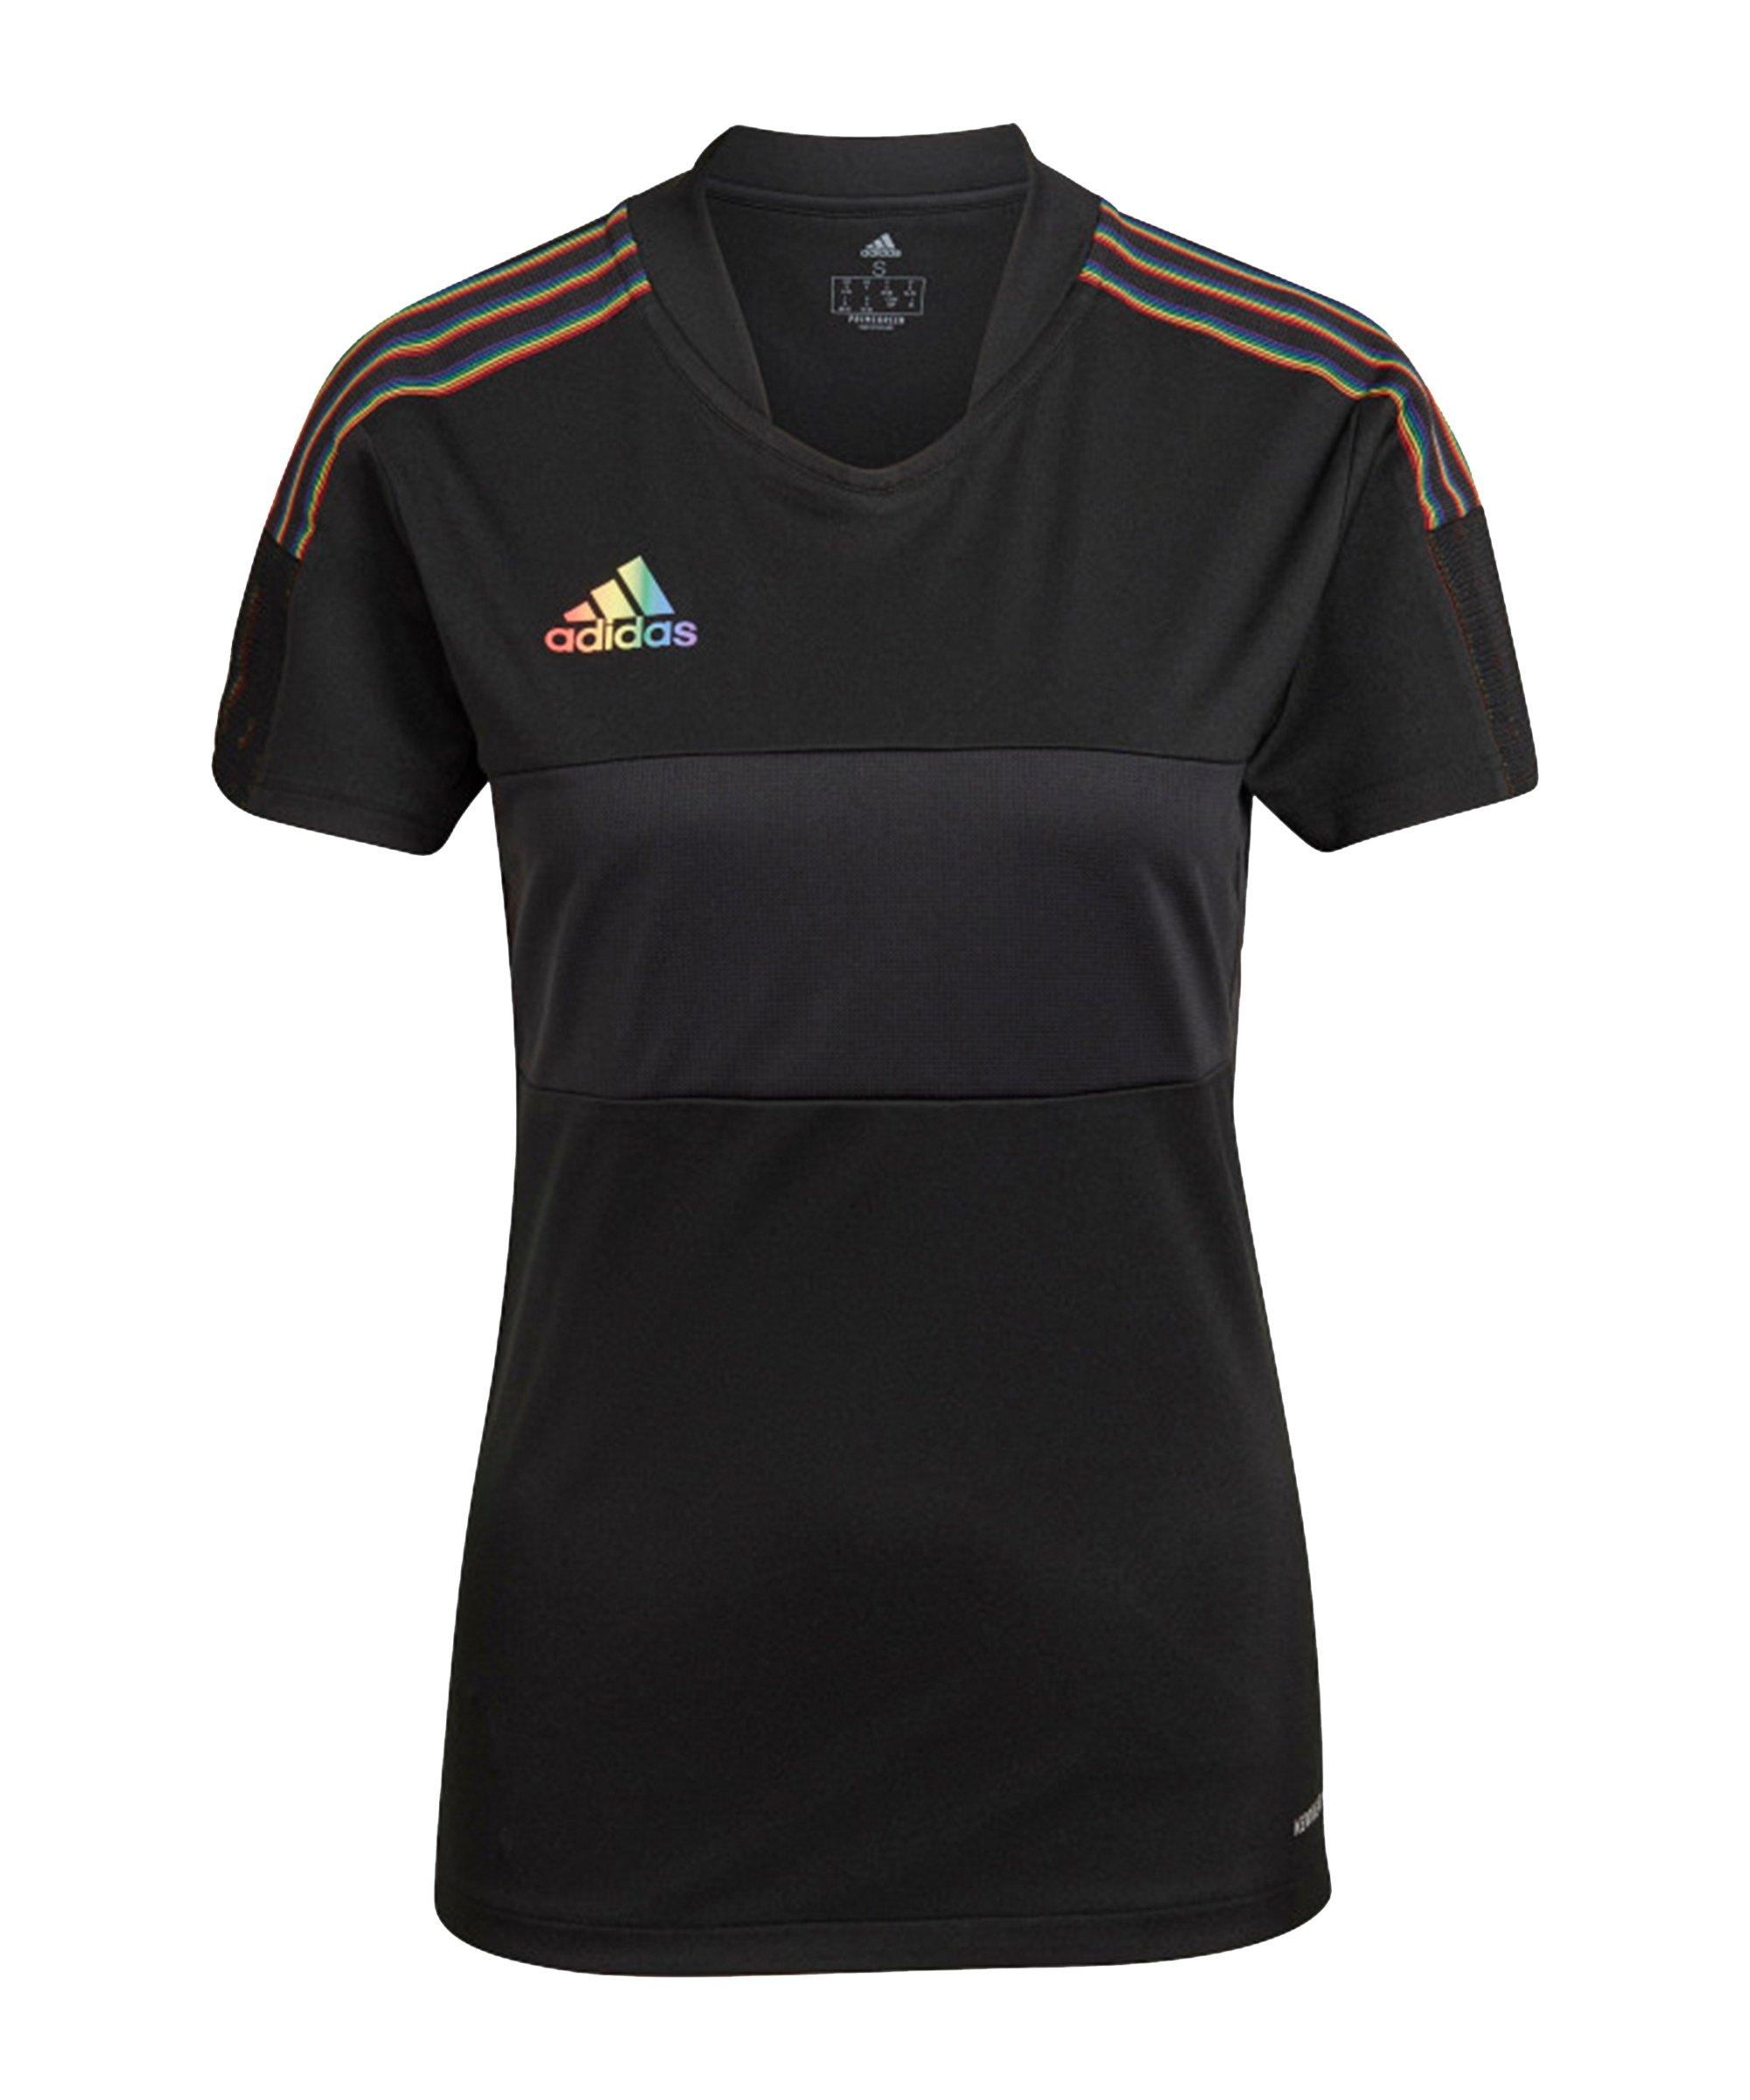 adidas Tiro Pride Trikot Damen Schwarz - schwarz